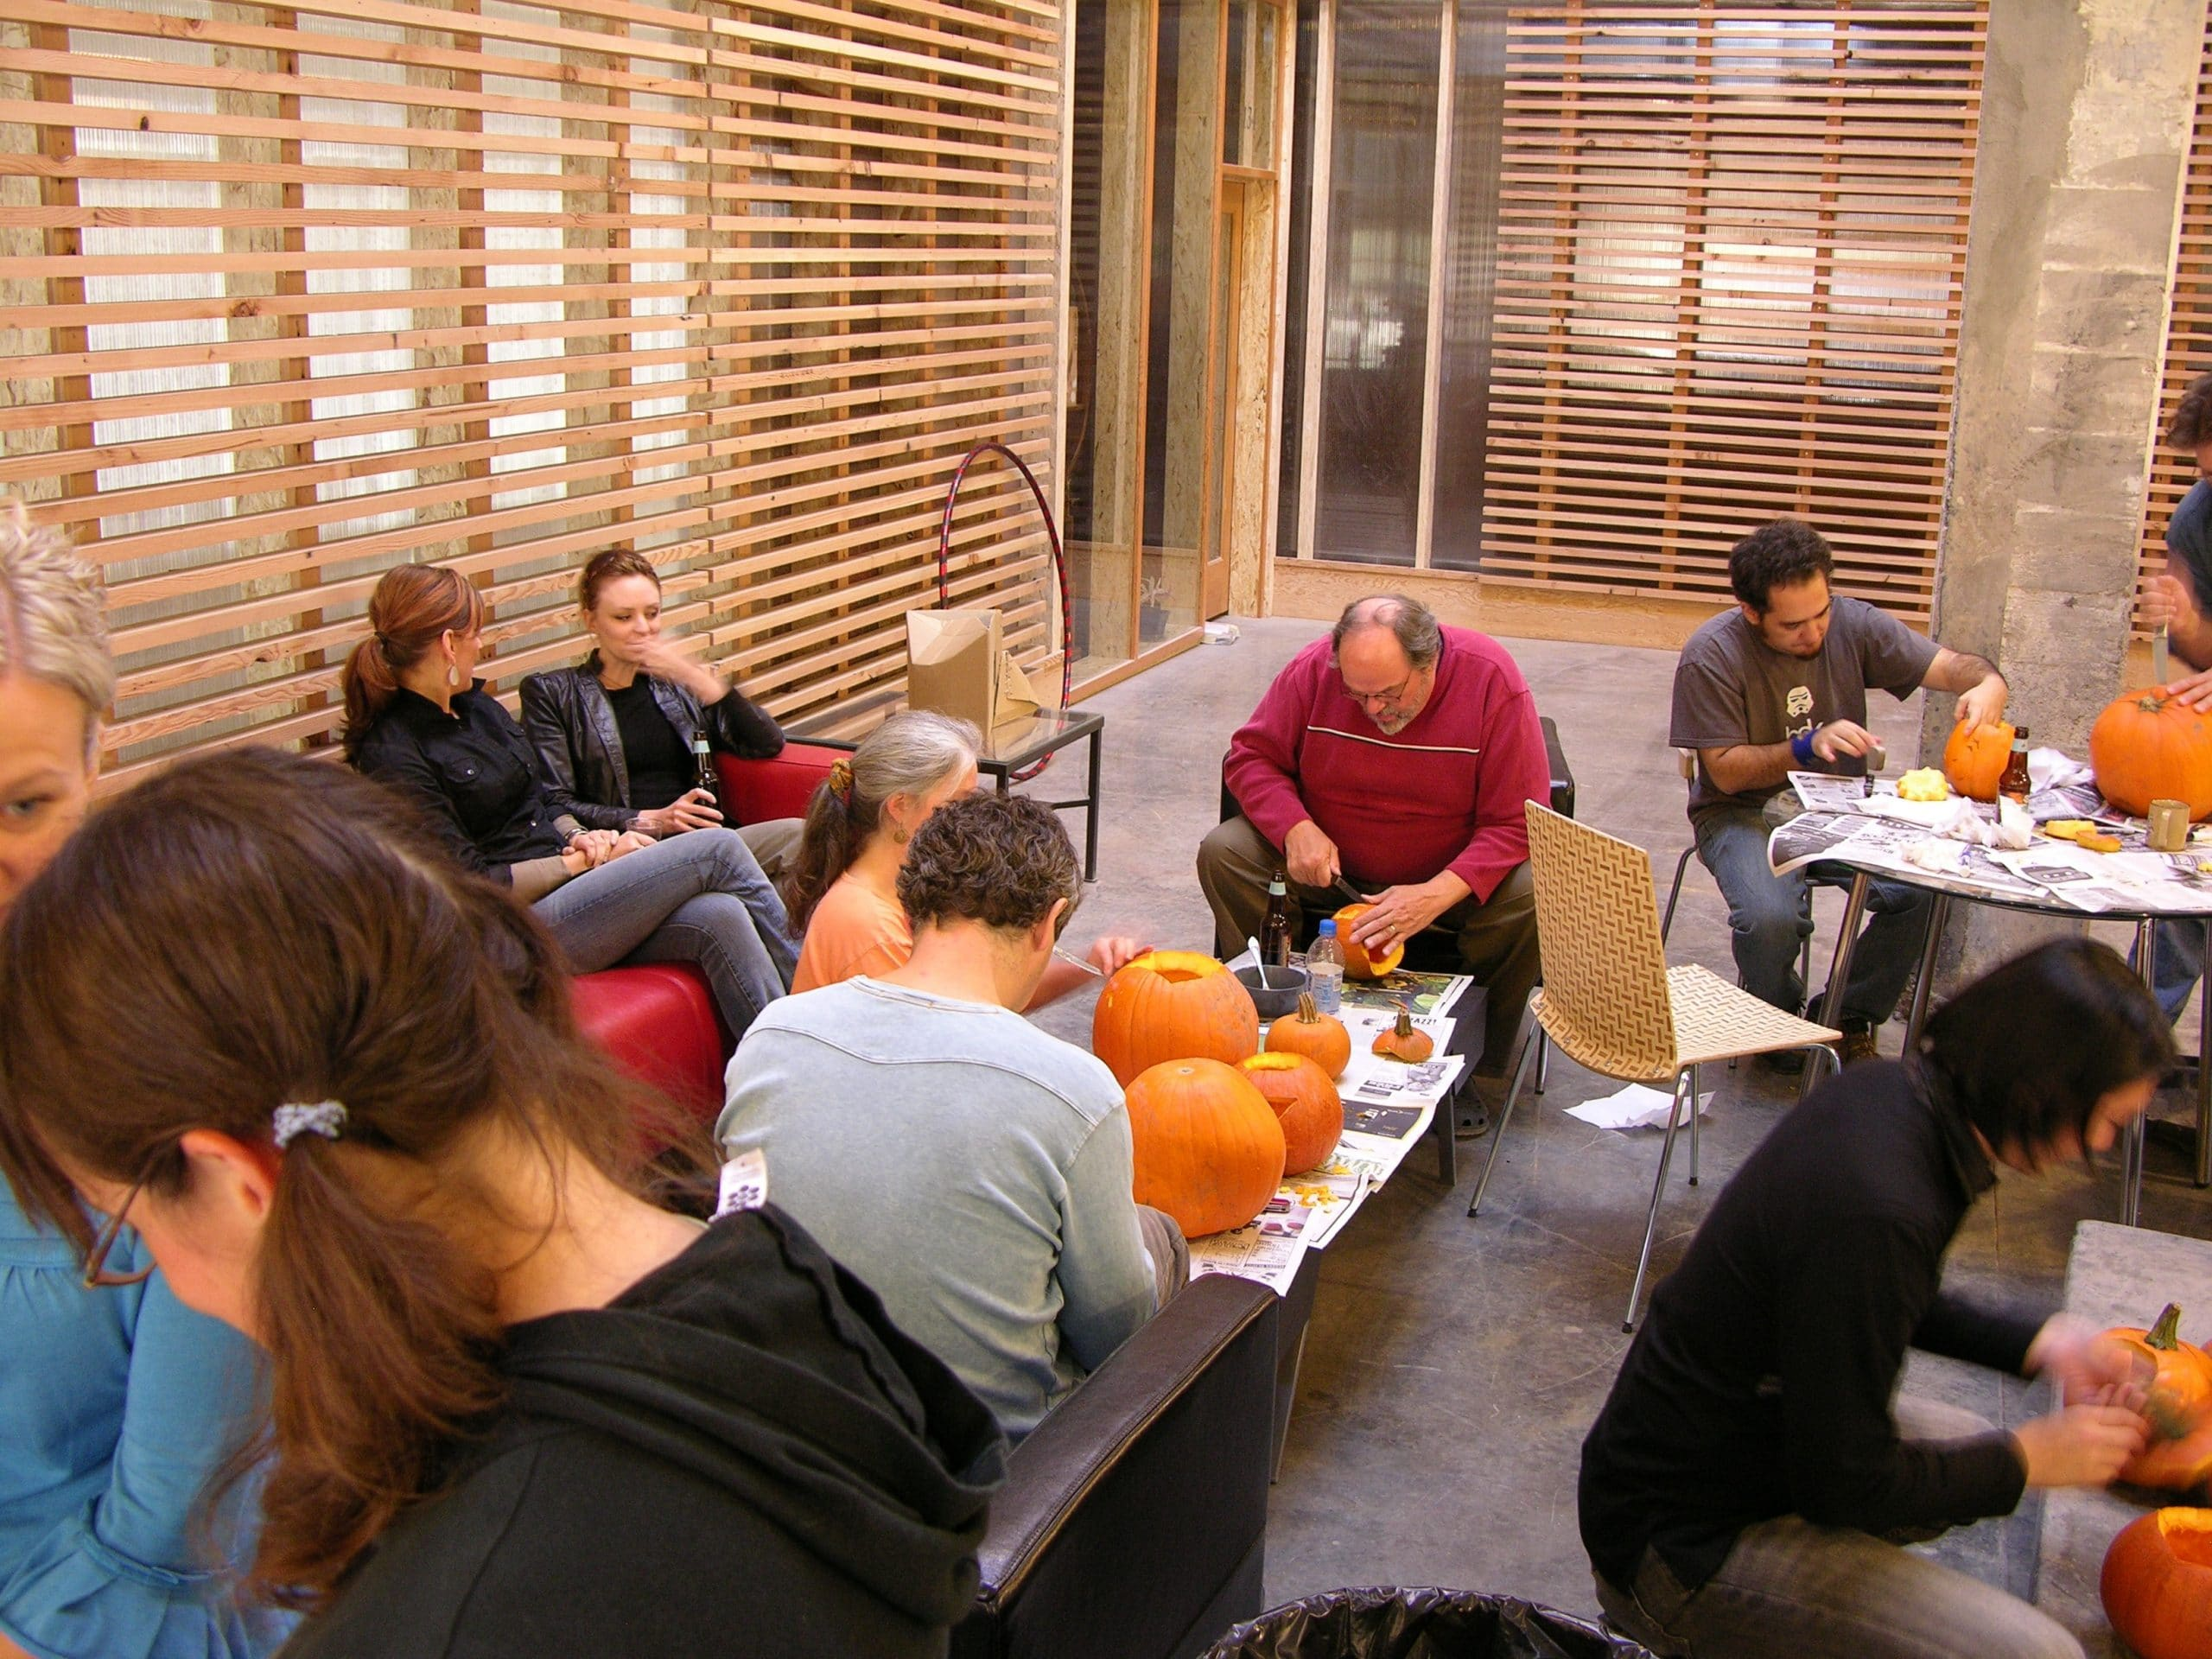 pumpkin-carving-group